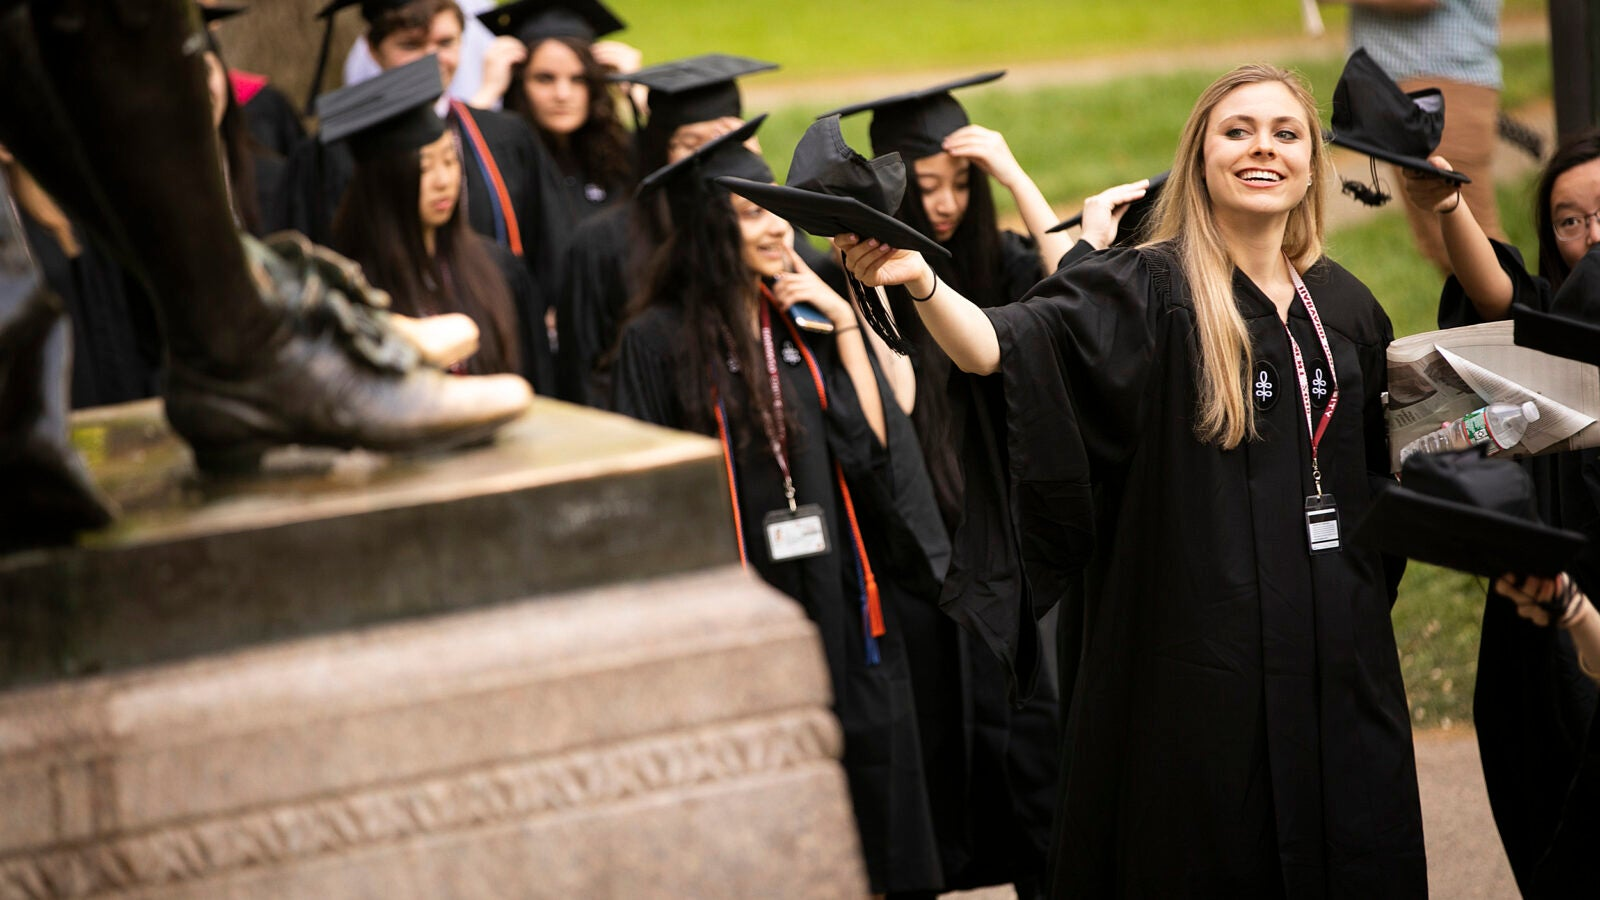 Graduates file past the John Harvard Statue.